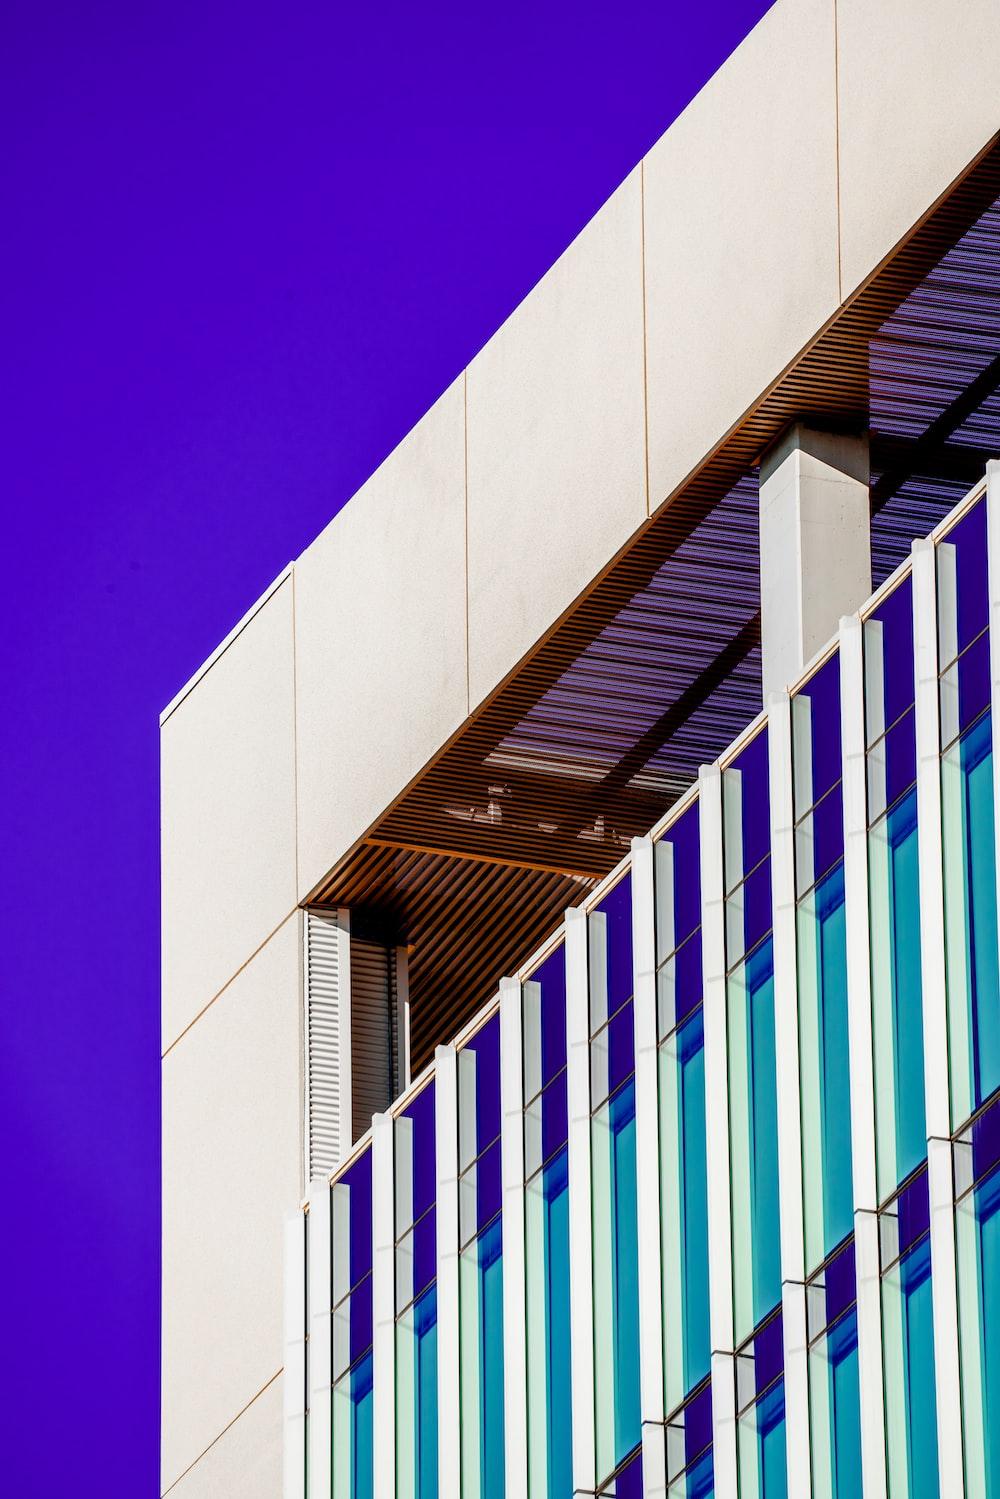 white and blue concrete building